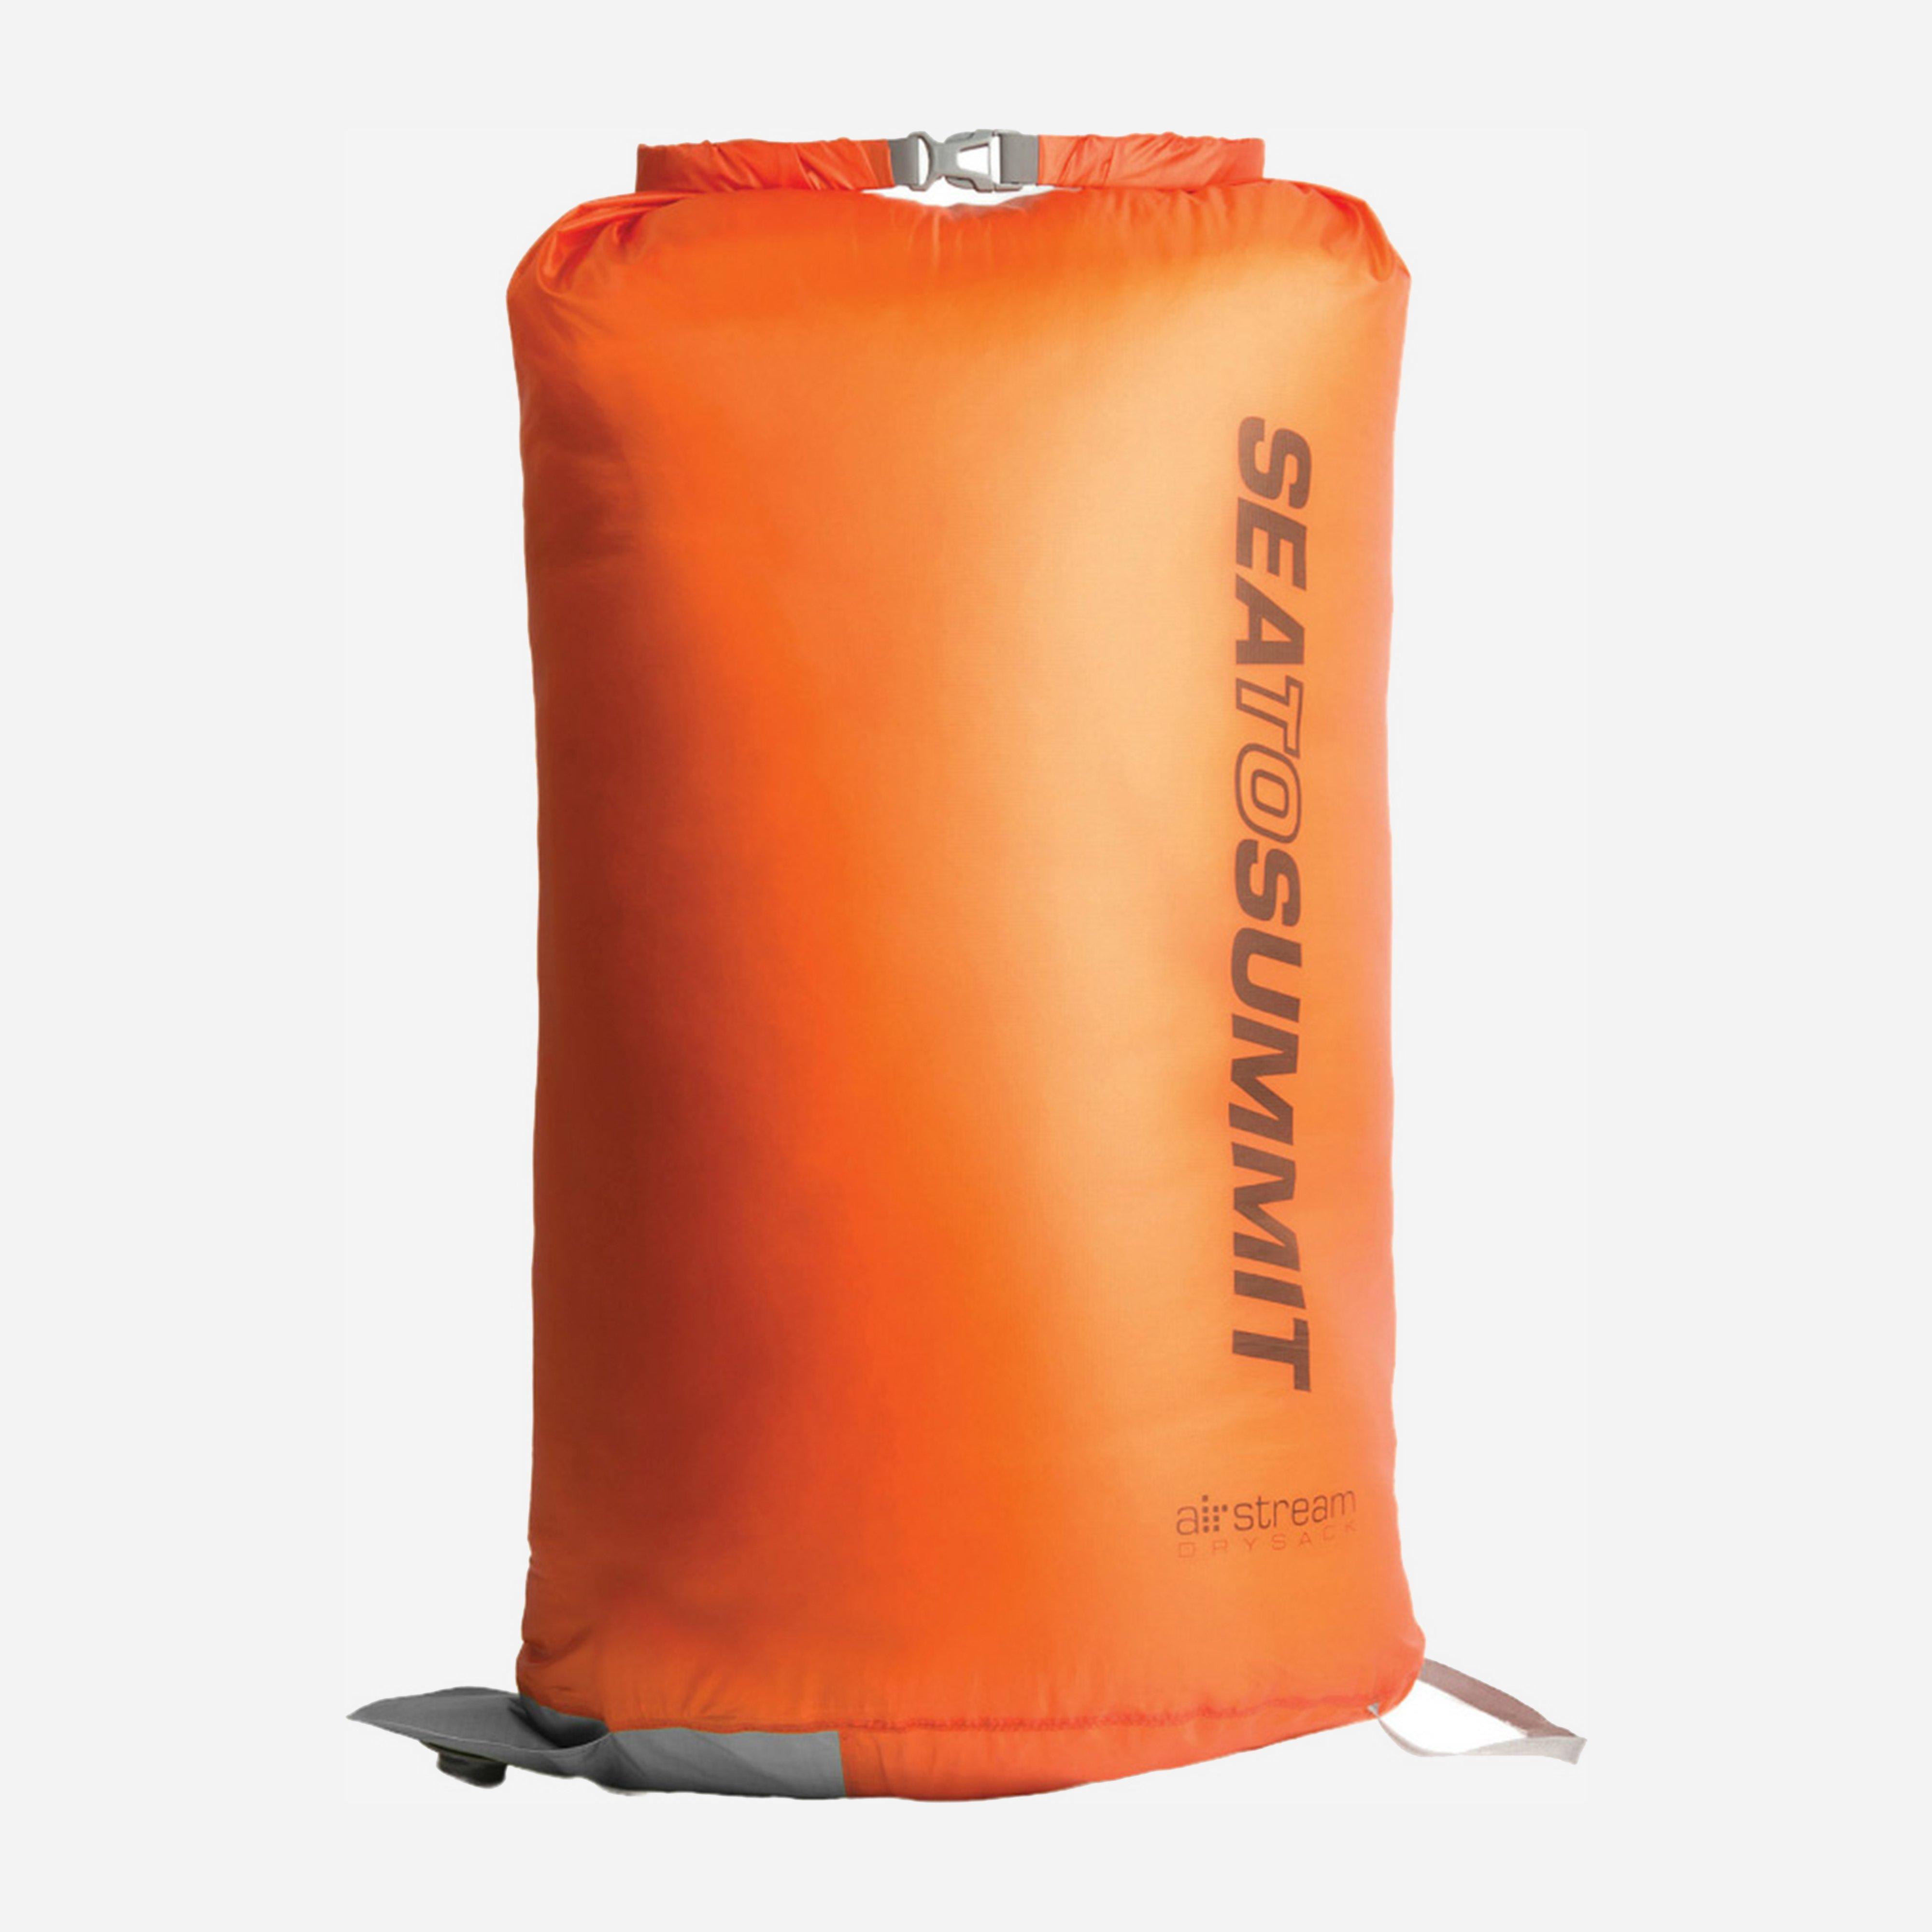 Sea To Summit Air Stream Pump Dry Sack - Orange/=  Orange/=